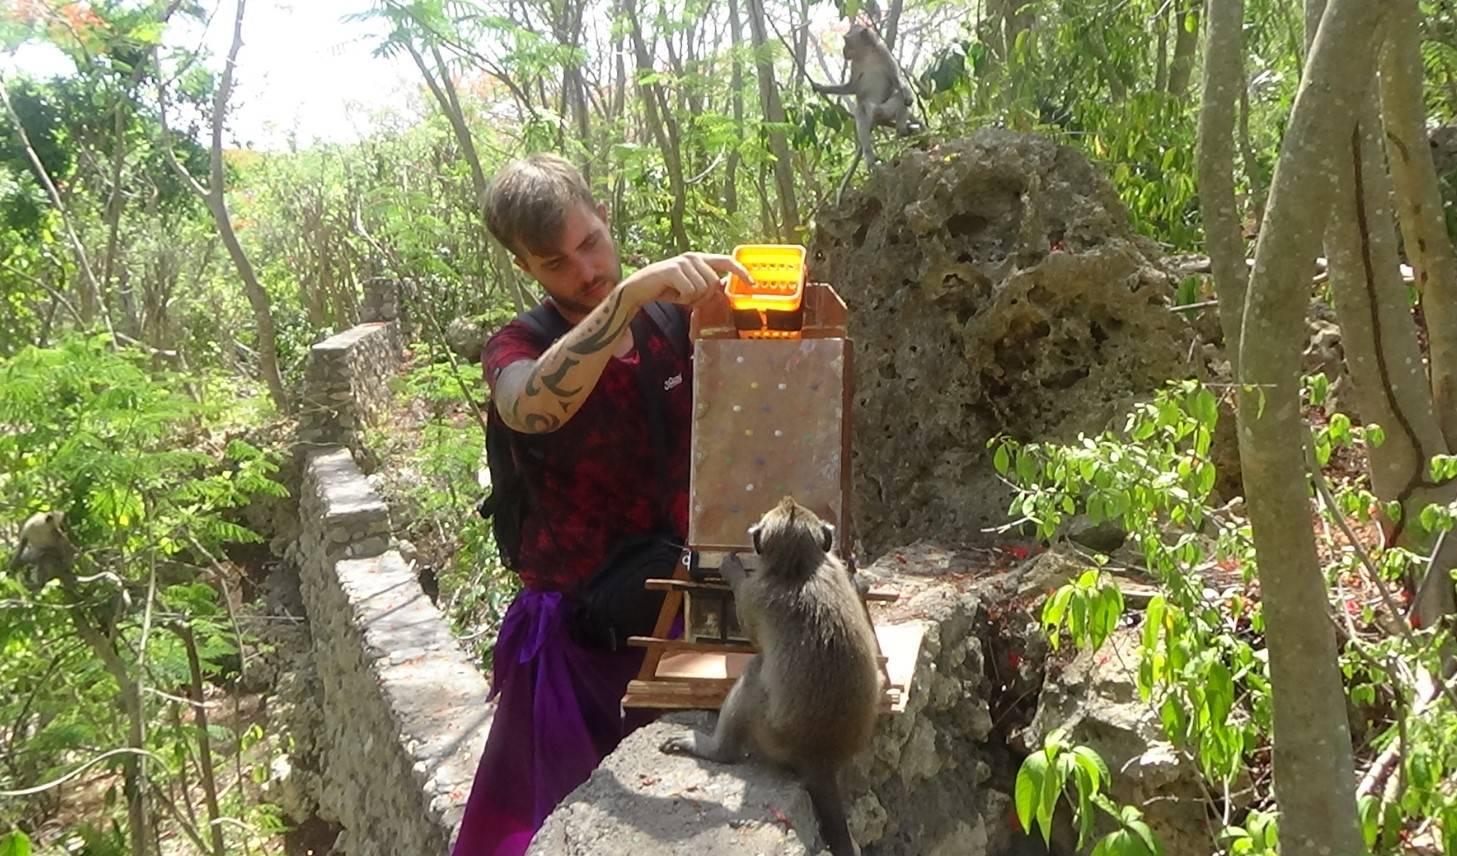 Matthew Gardiner experimentally inducing bartering in a long-tailed macaque (Uluwatu, Bali, Nov. 2019)